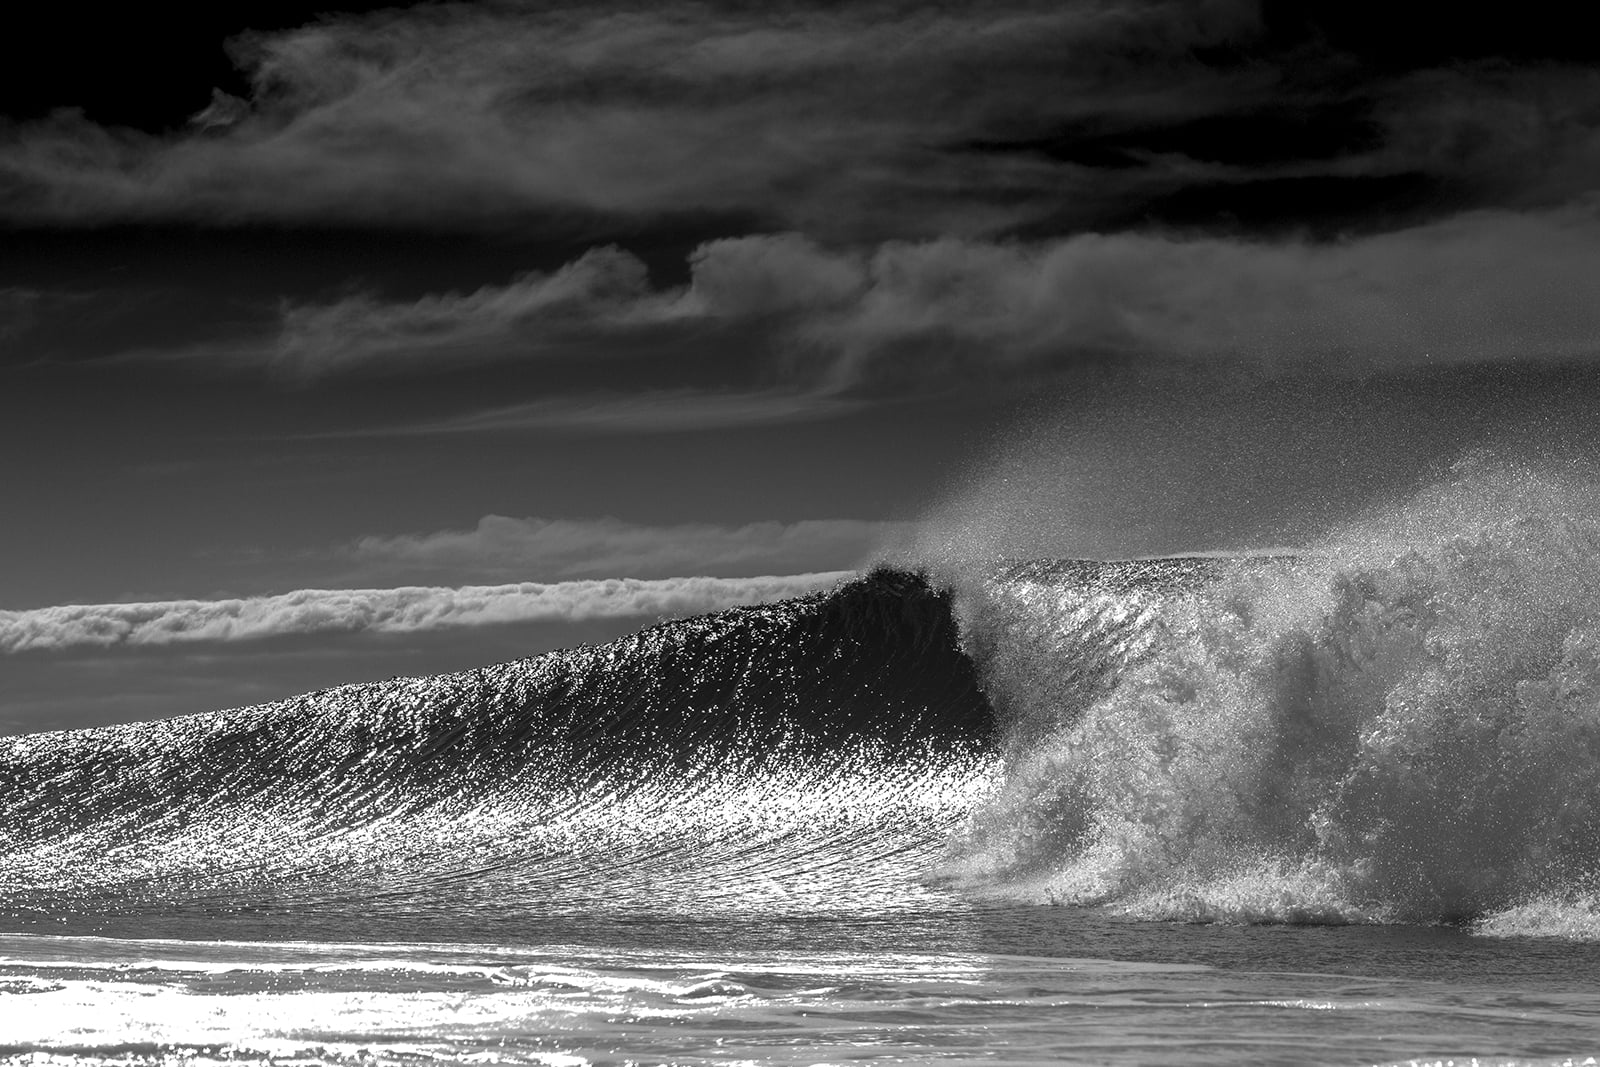 blackandwhite wave.jpg